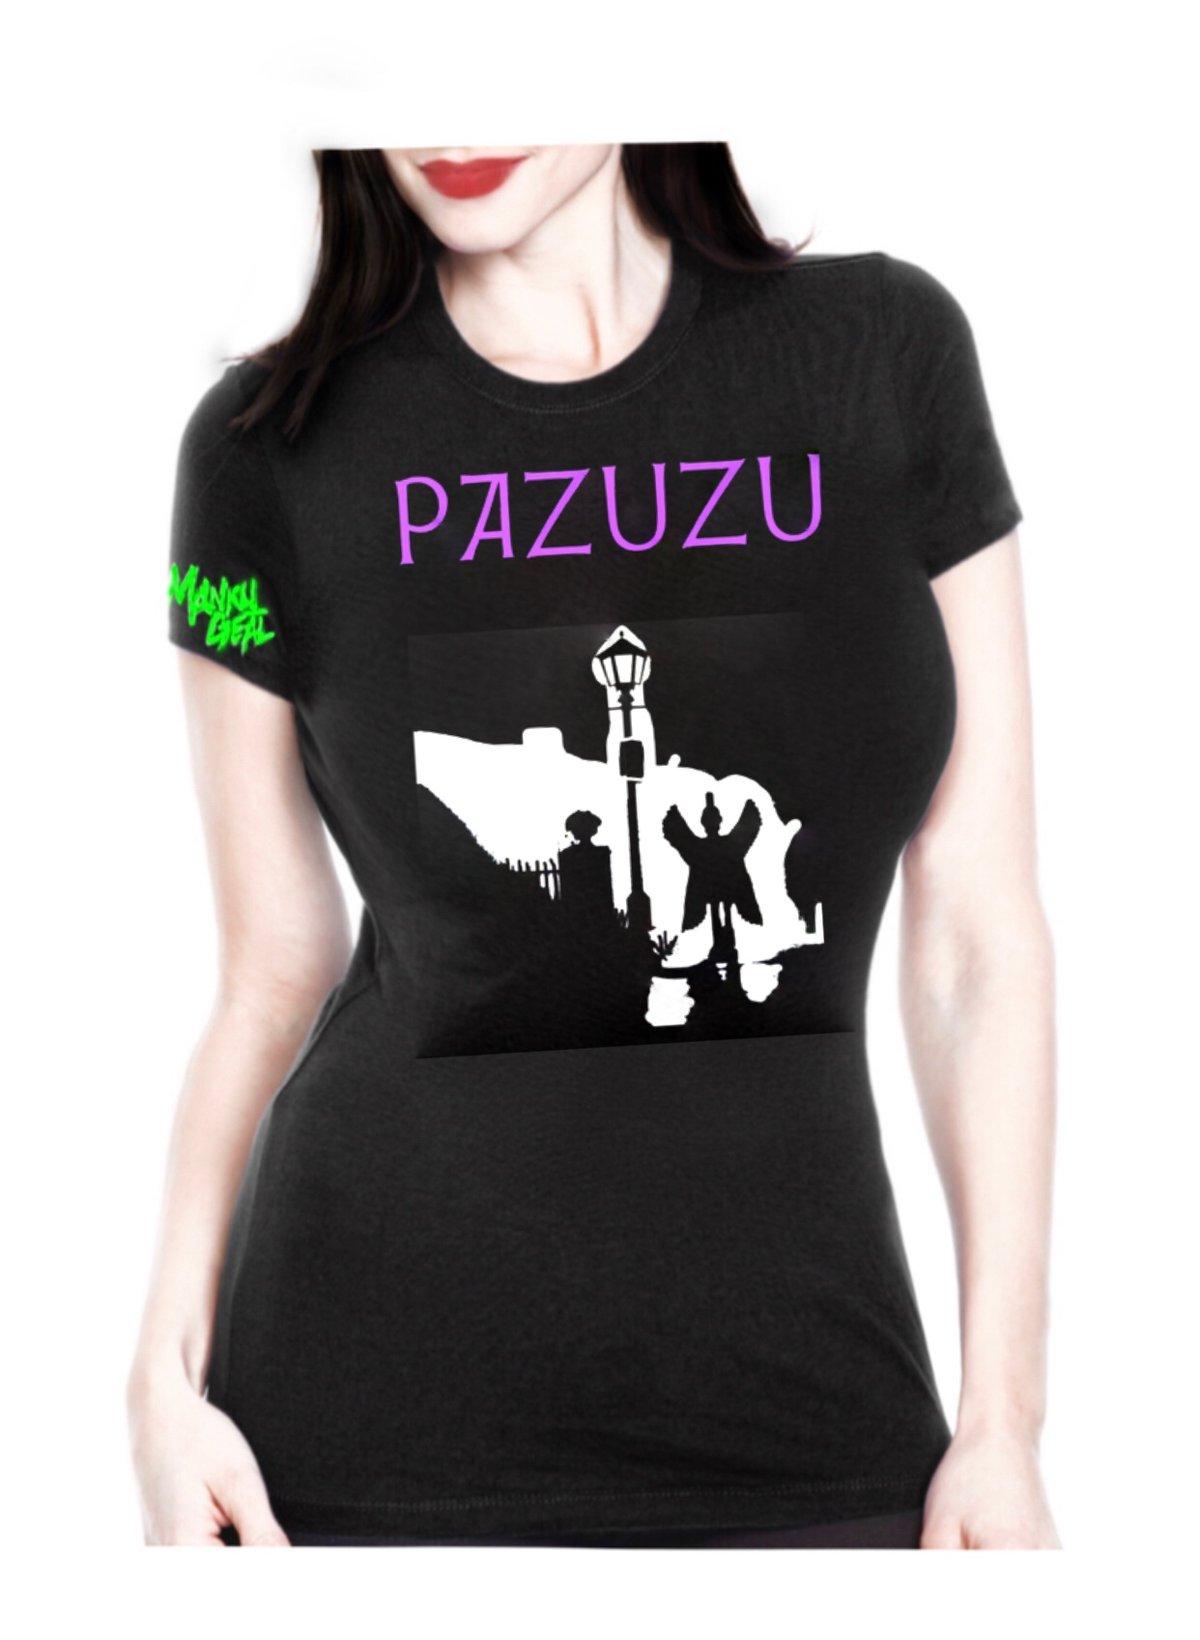 Image of Pazuzu Women's Tee